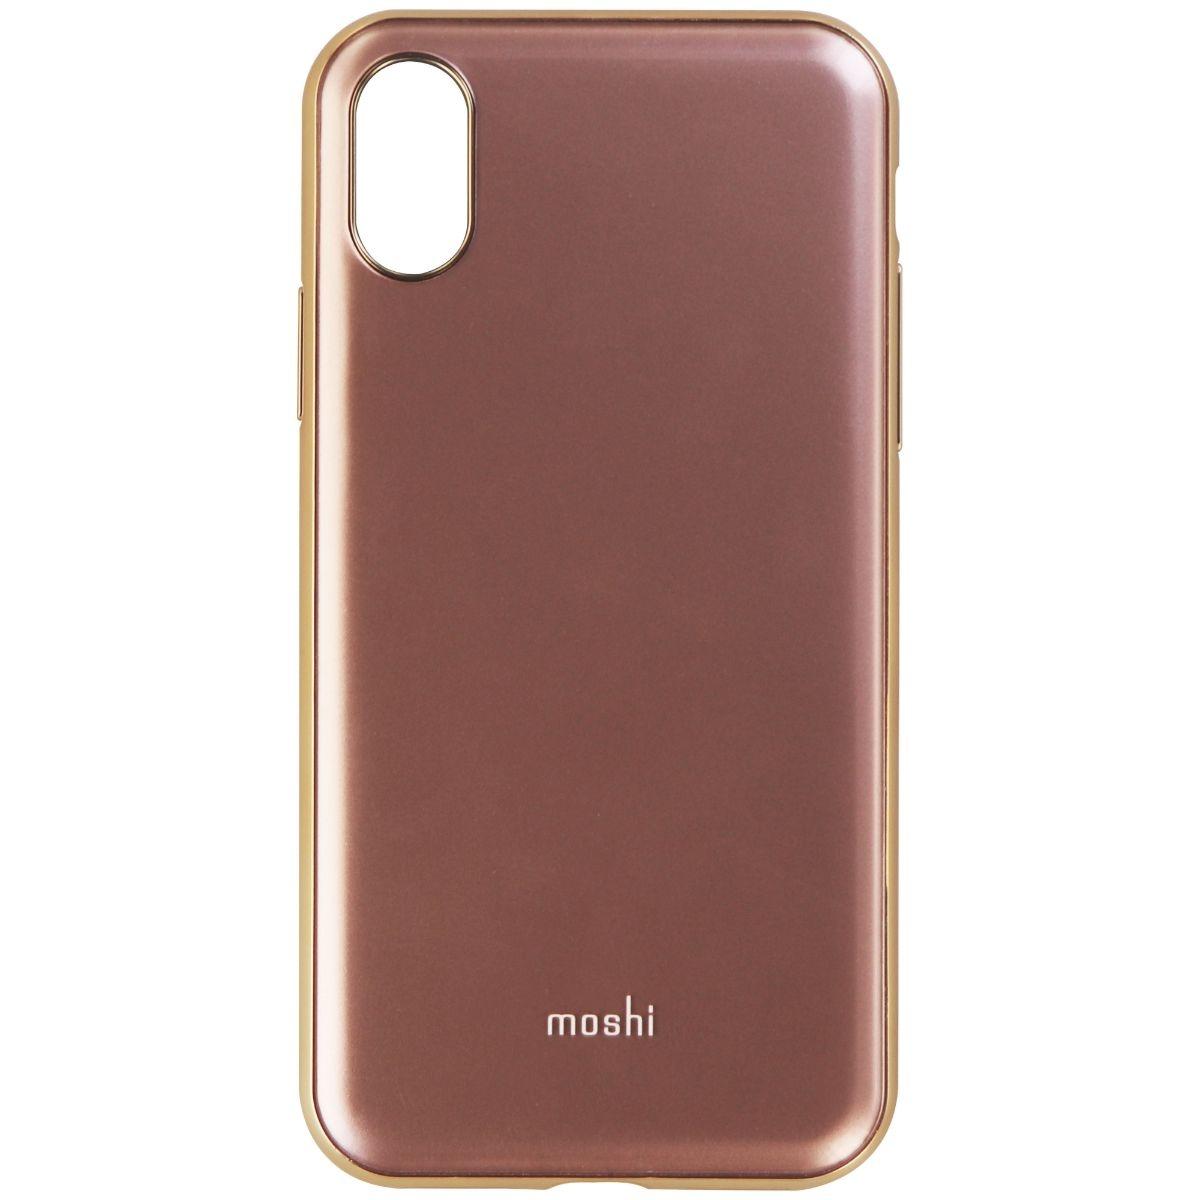 Moshi iGlaze Series Hybrid Hard Case for Apple iPhone X - Pink / Gold